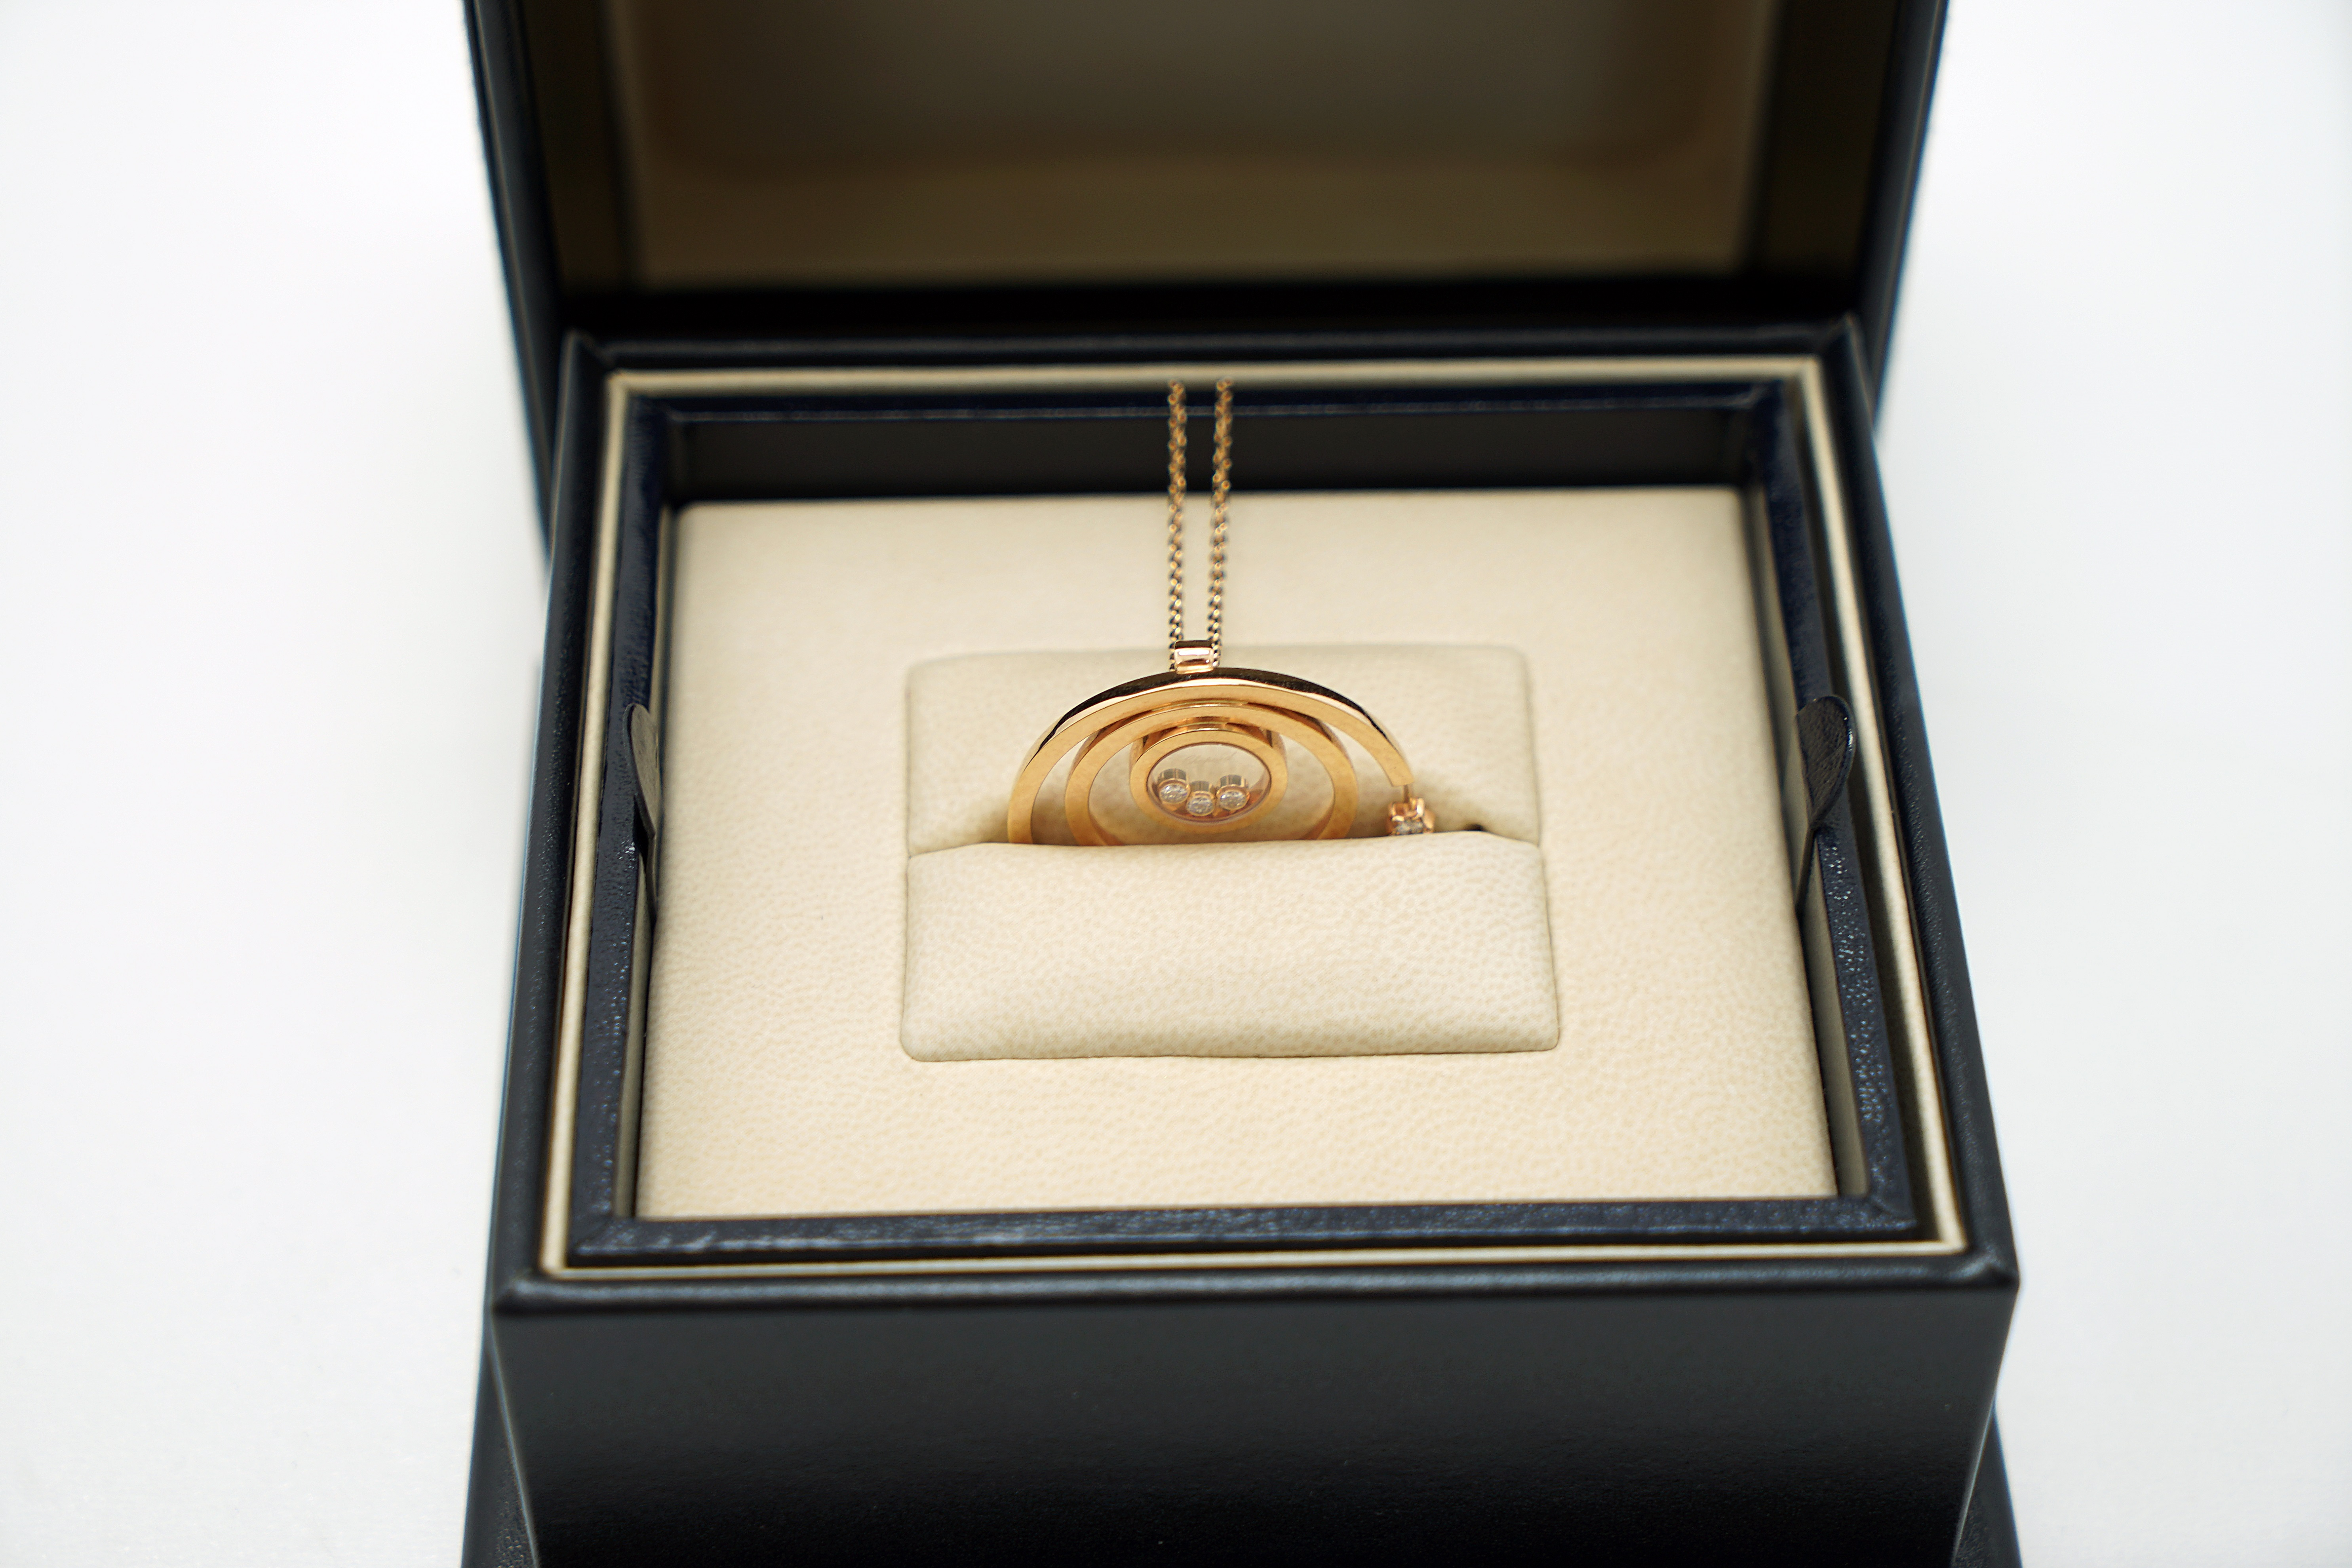 A Lady's Chopard 18K Rose Gold , Happy Diamonds pendant - Image 4 of 9